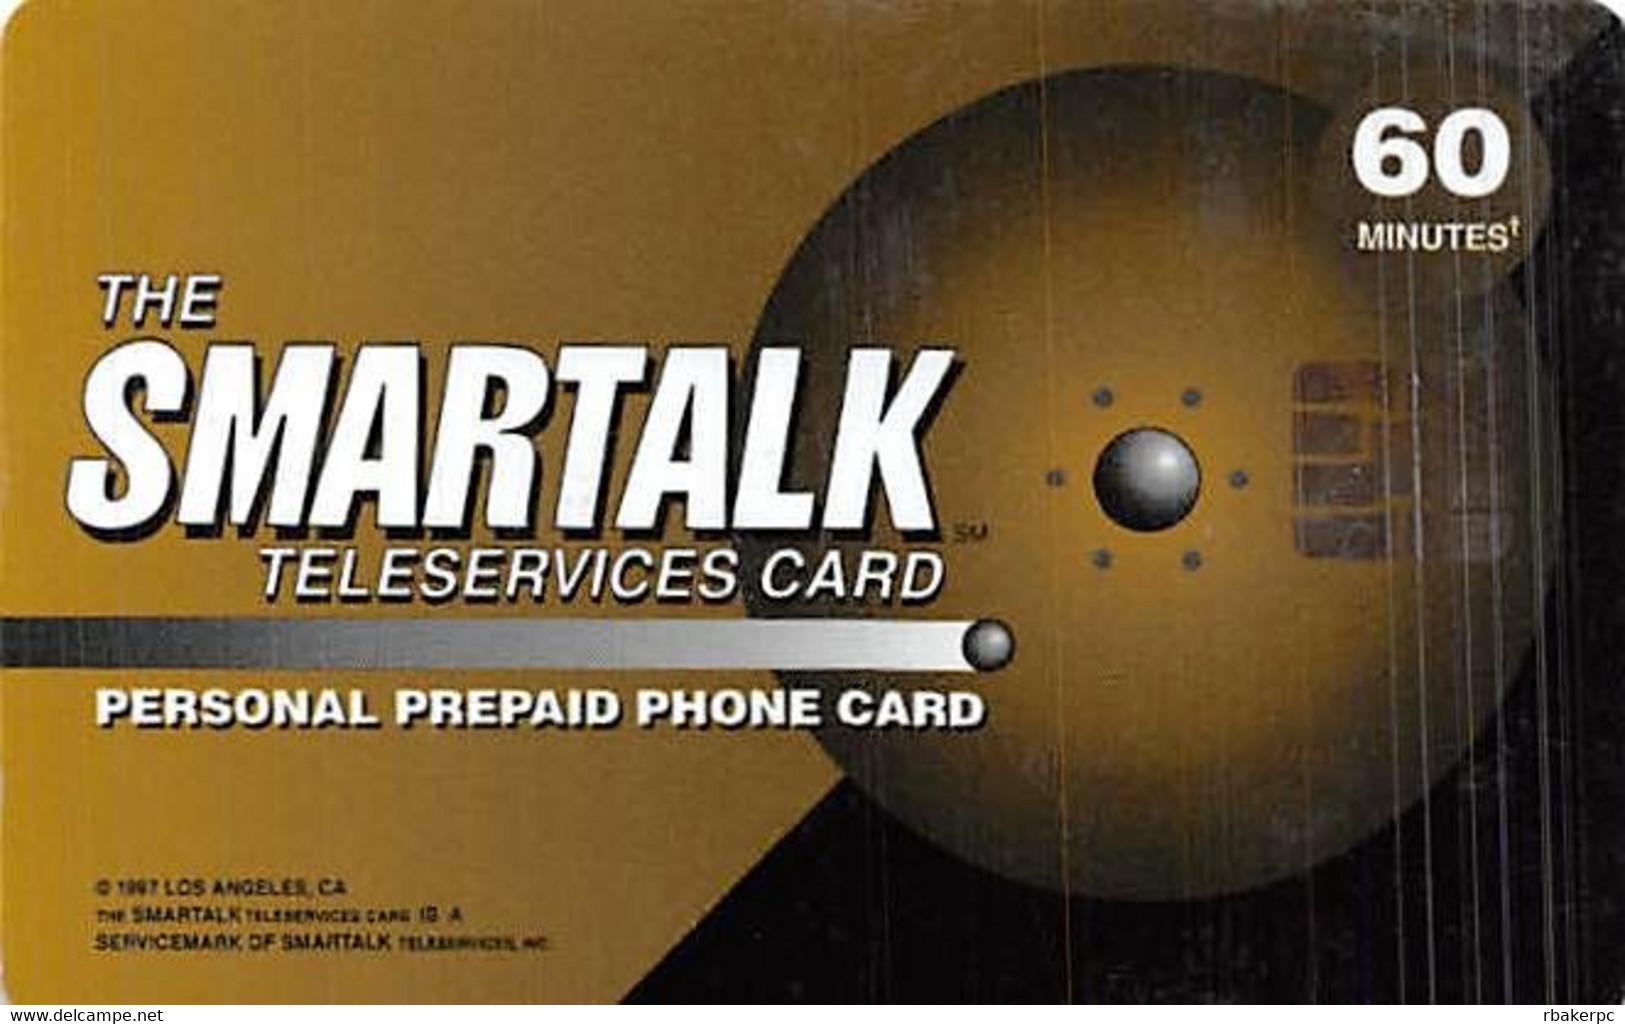 60 Minute Smartalk Teleservices Card With Smartchip - Telecom Operators